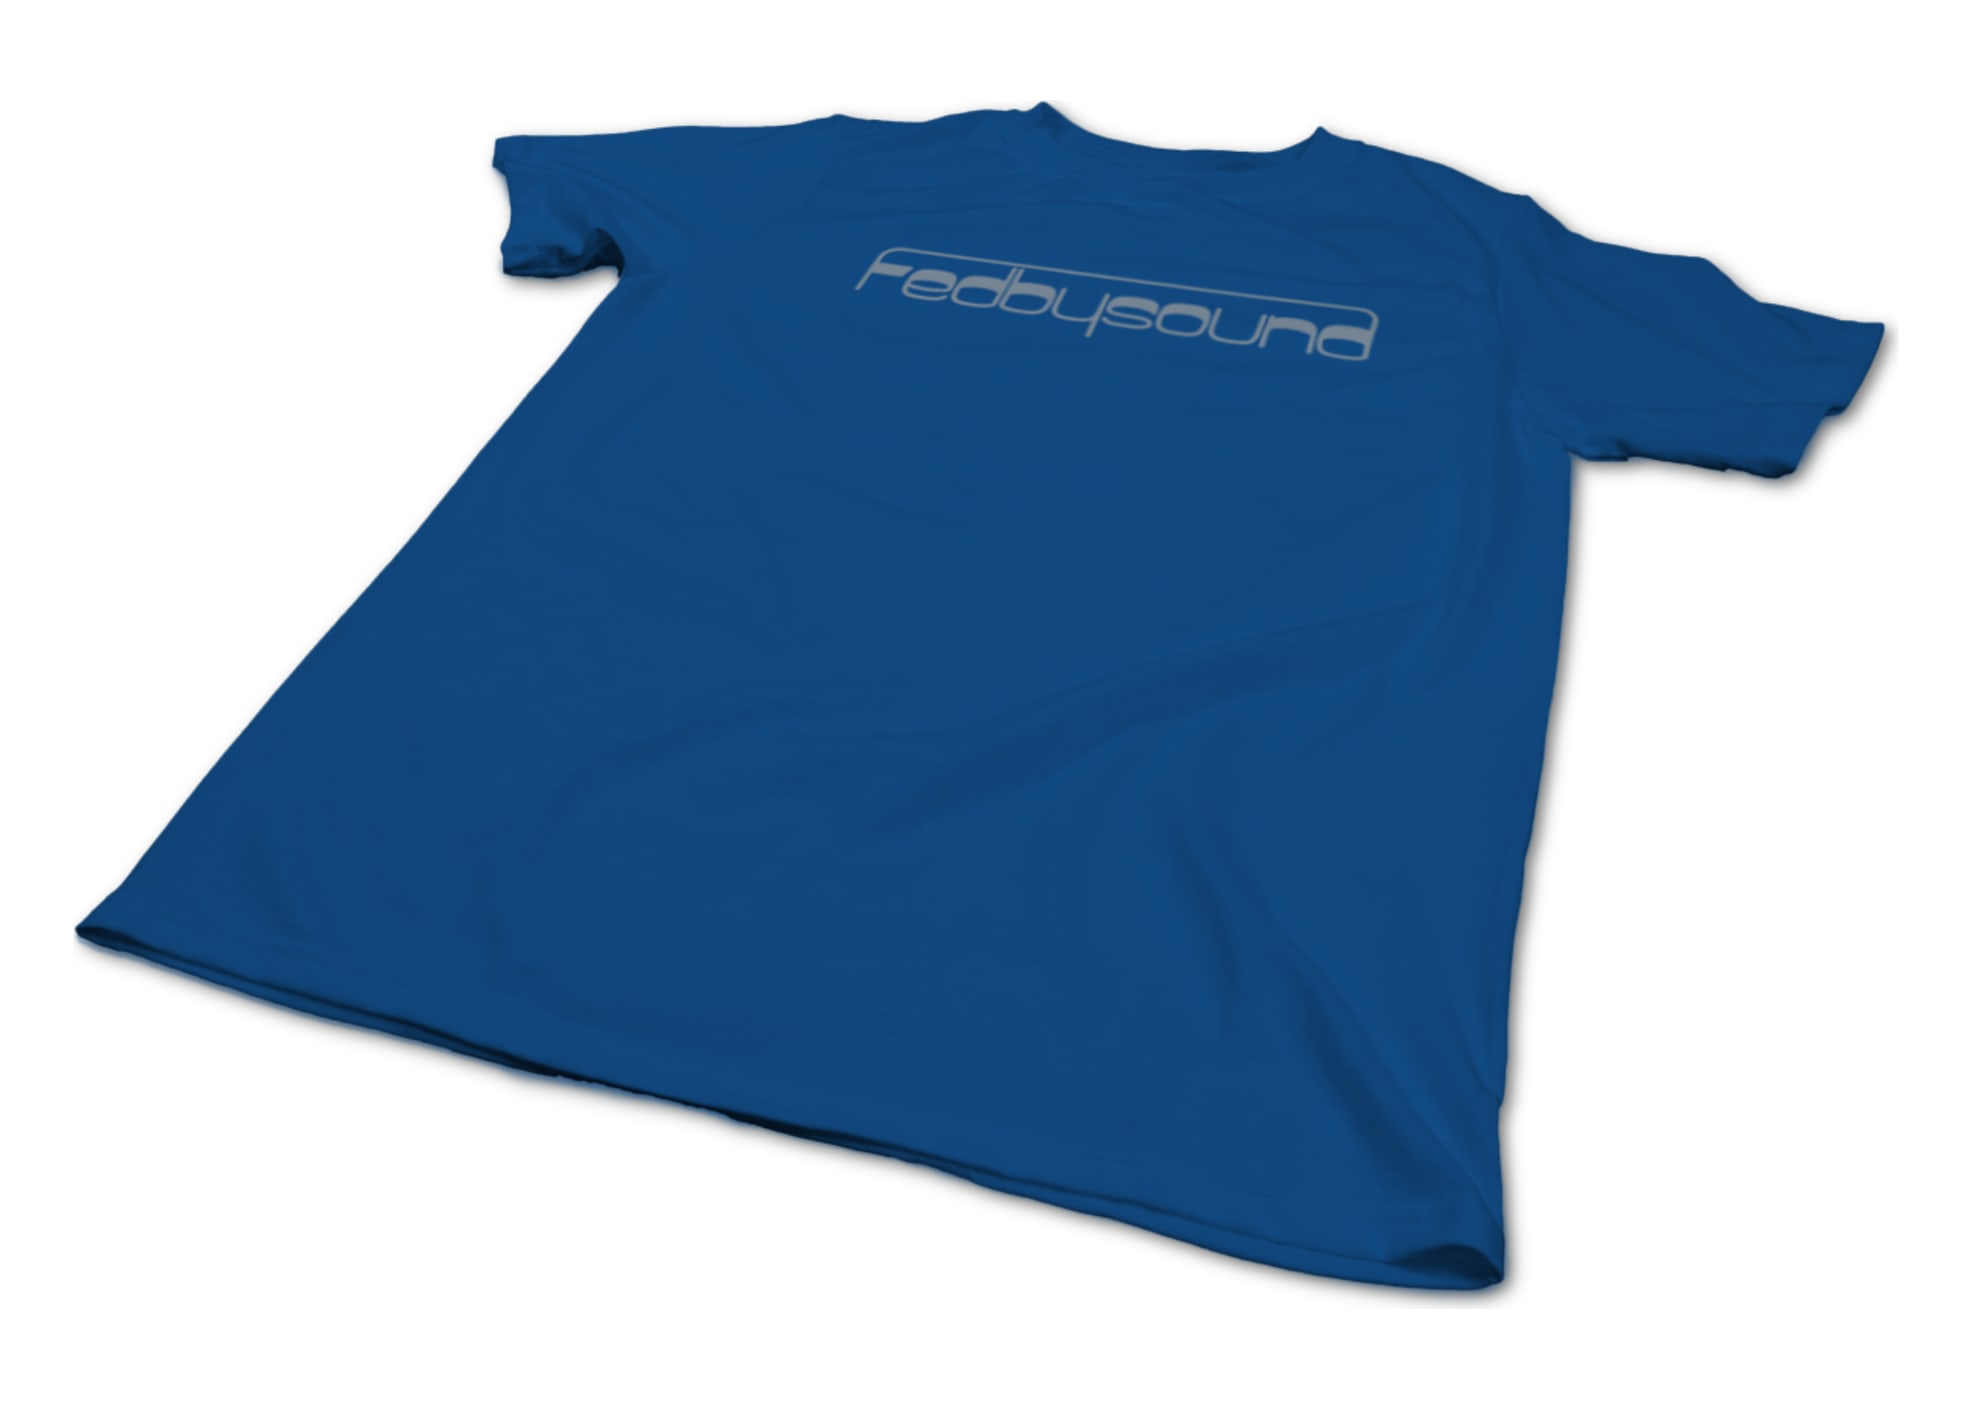 Fedbysound logo  gray on blue  1600098542